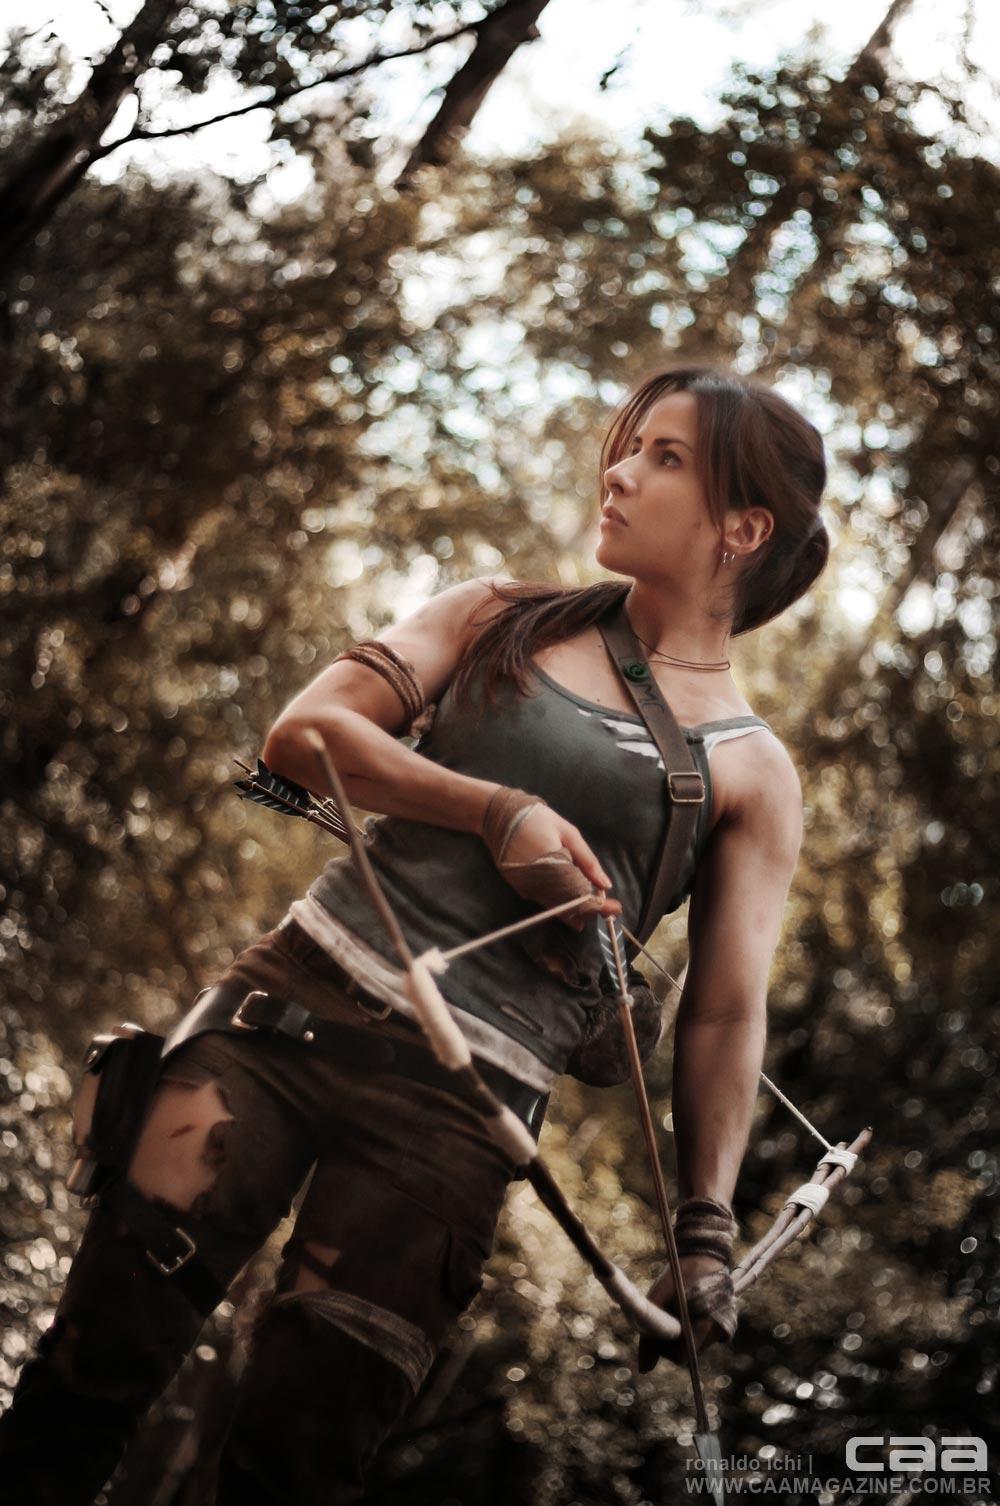 Lara croft topless exploited scene